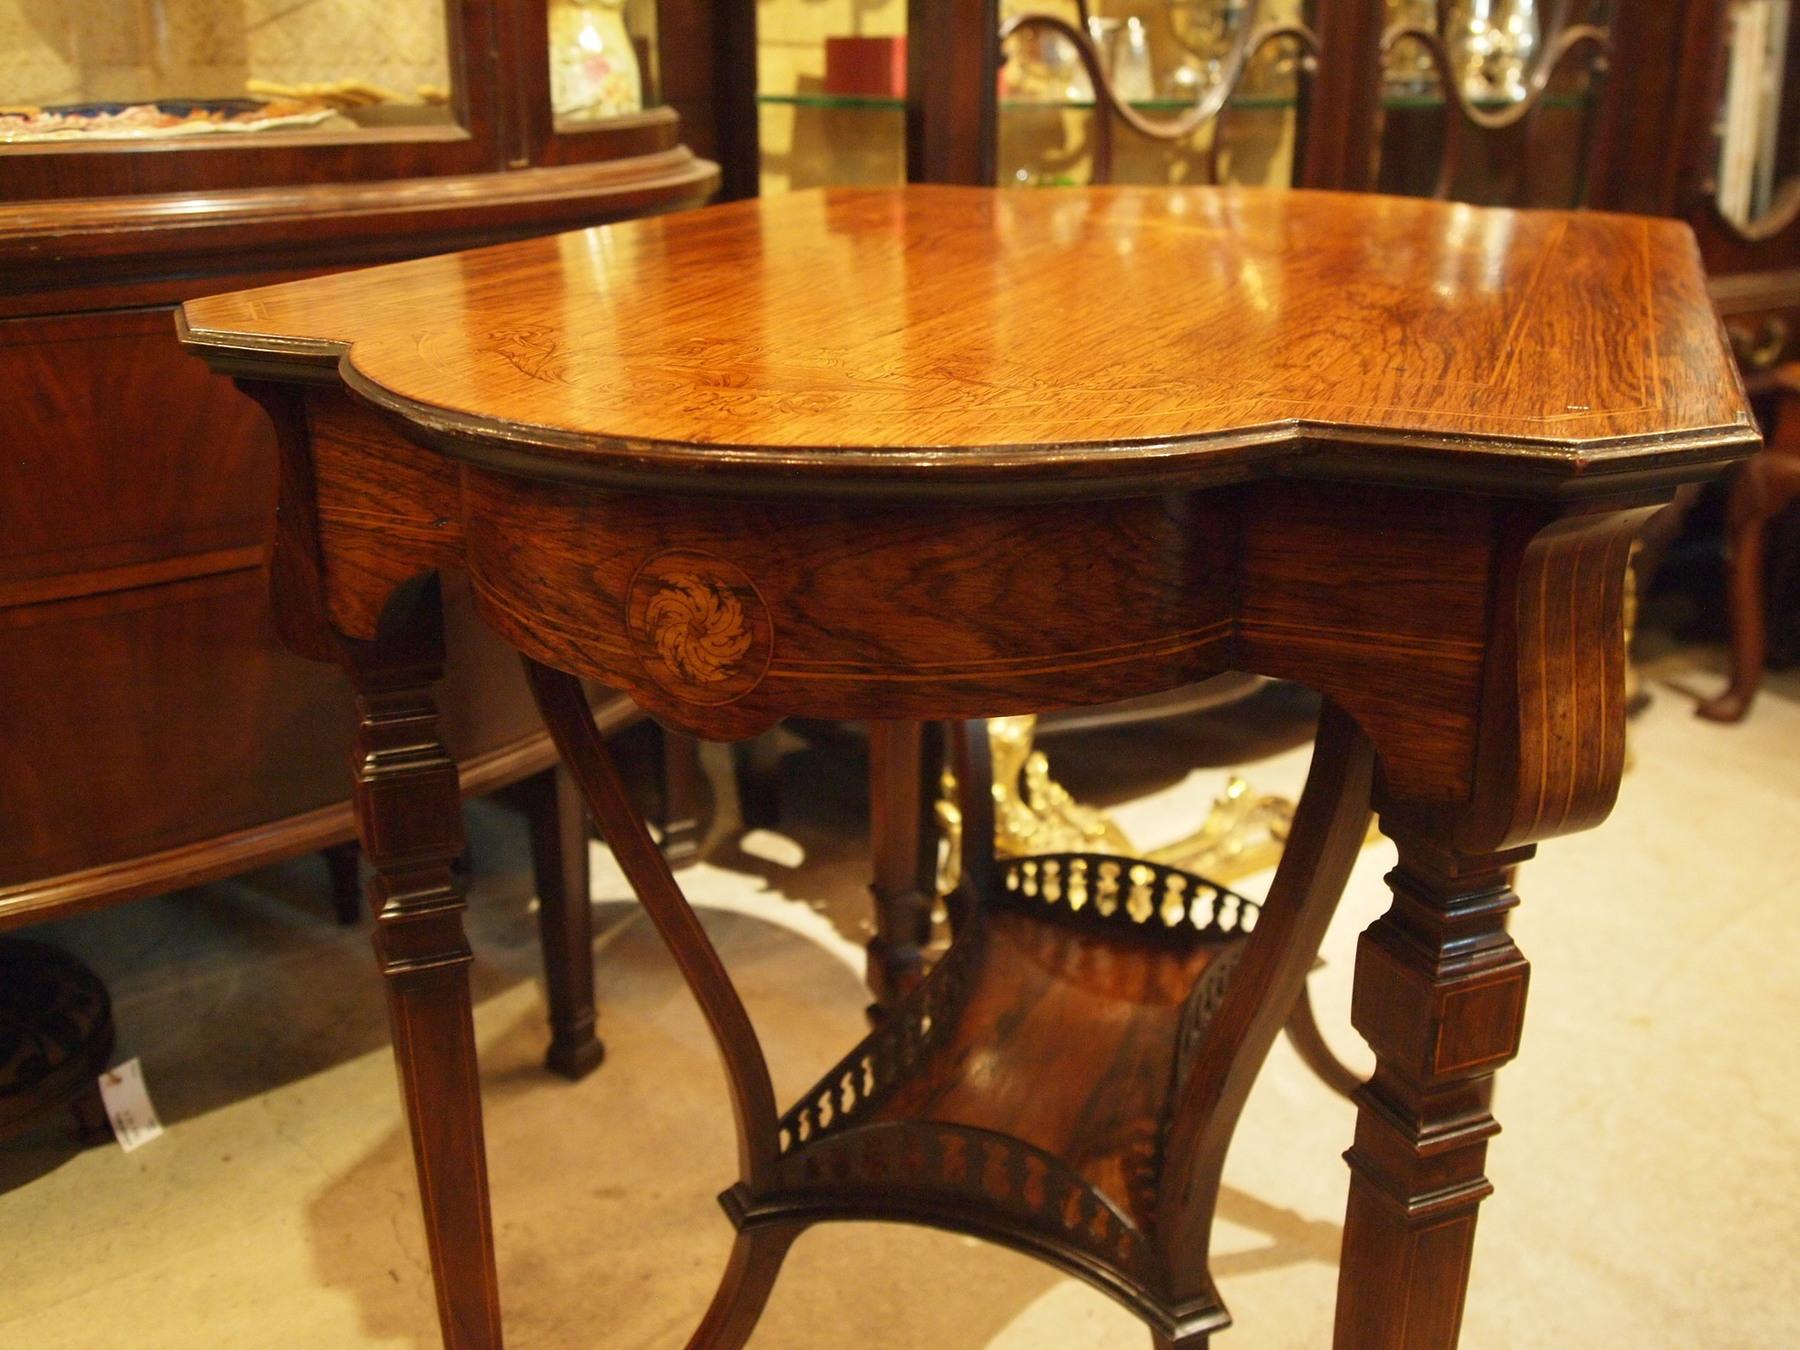 table200628_11.JPG